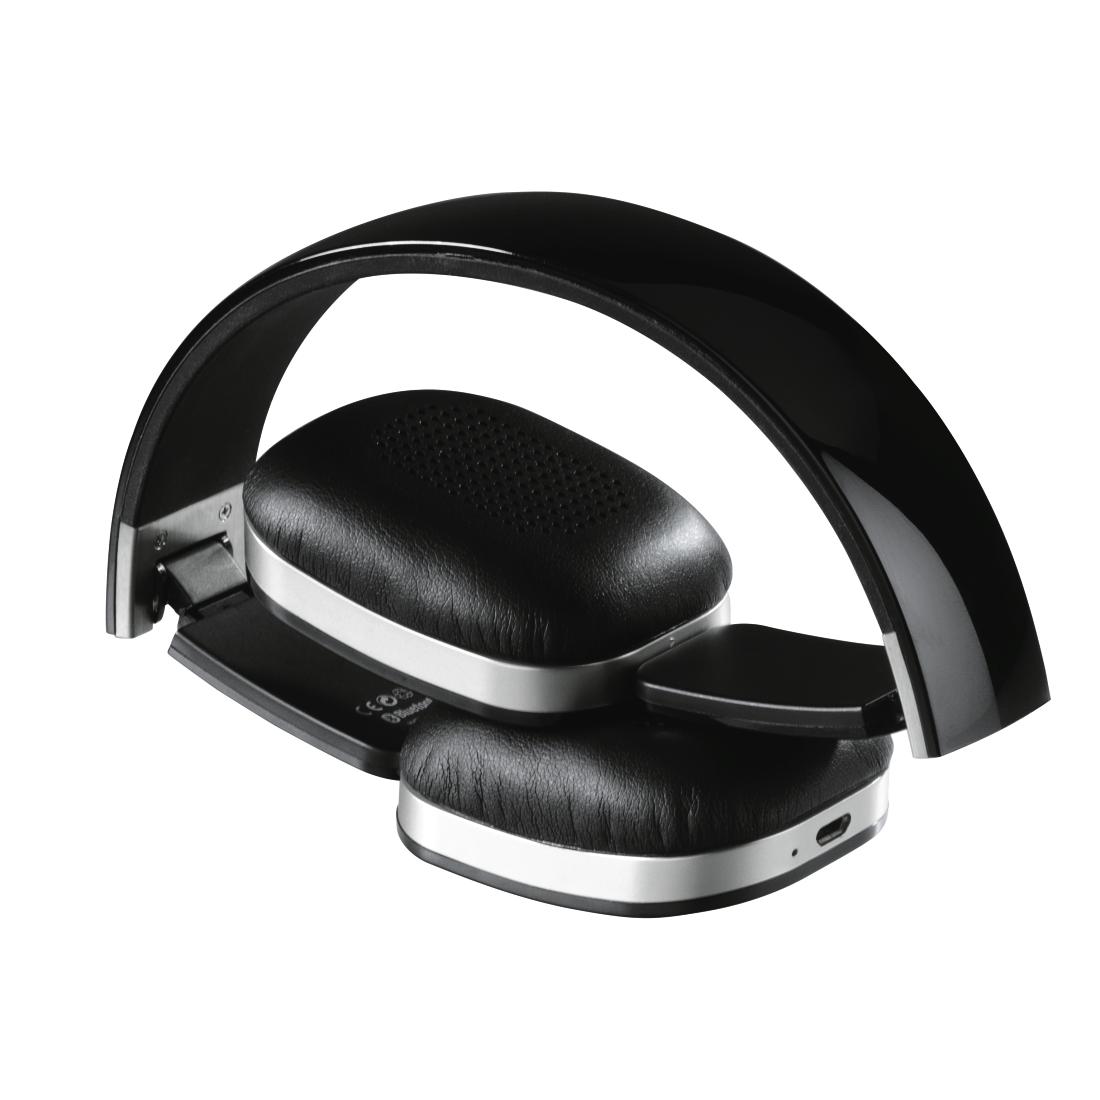 00015652 hama bluetooth stereo headset speed schwarz. Black Bedroom Furniture Sets. Home Design Ideas